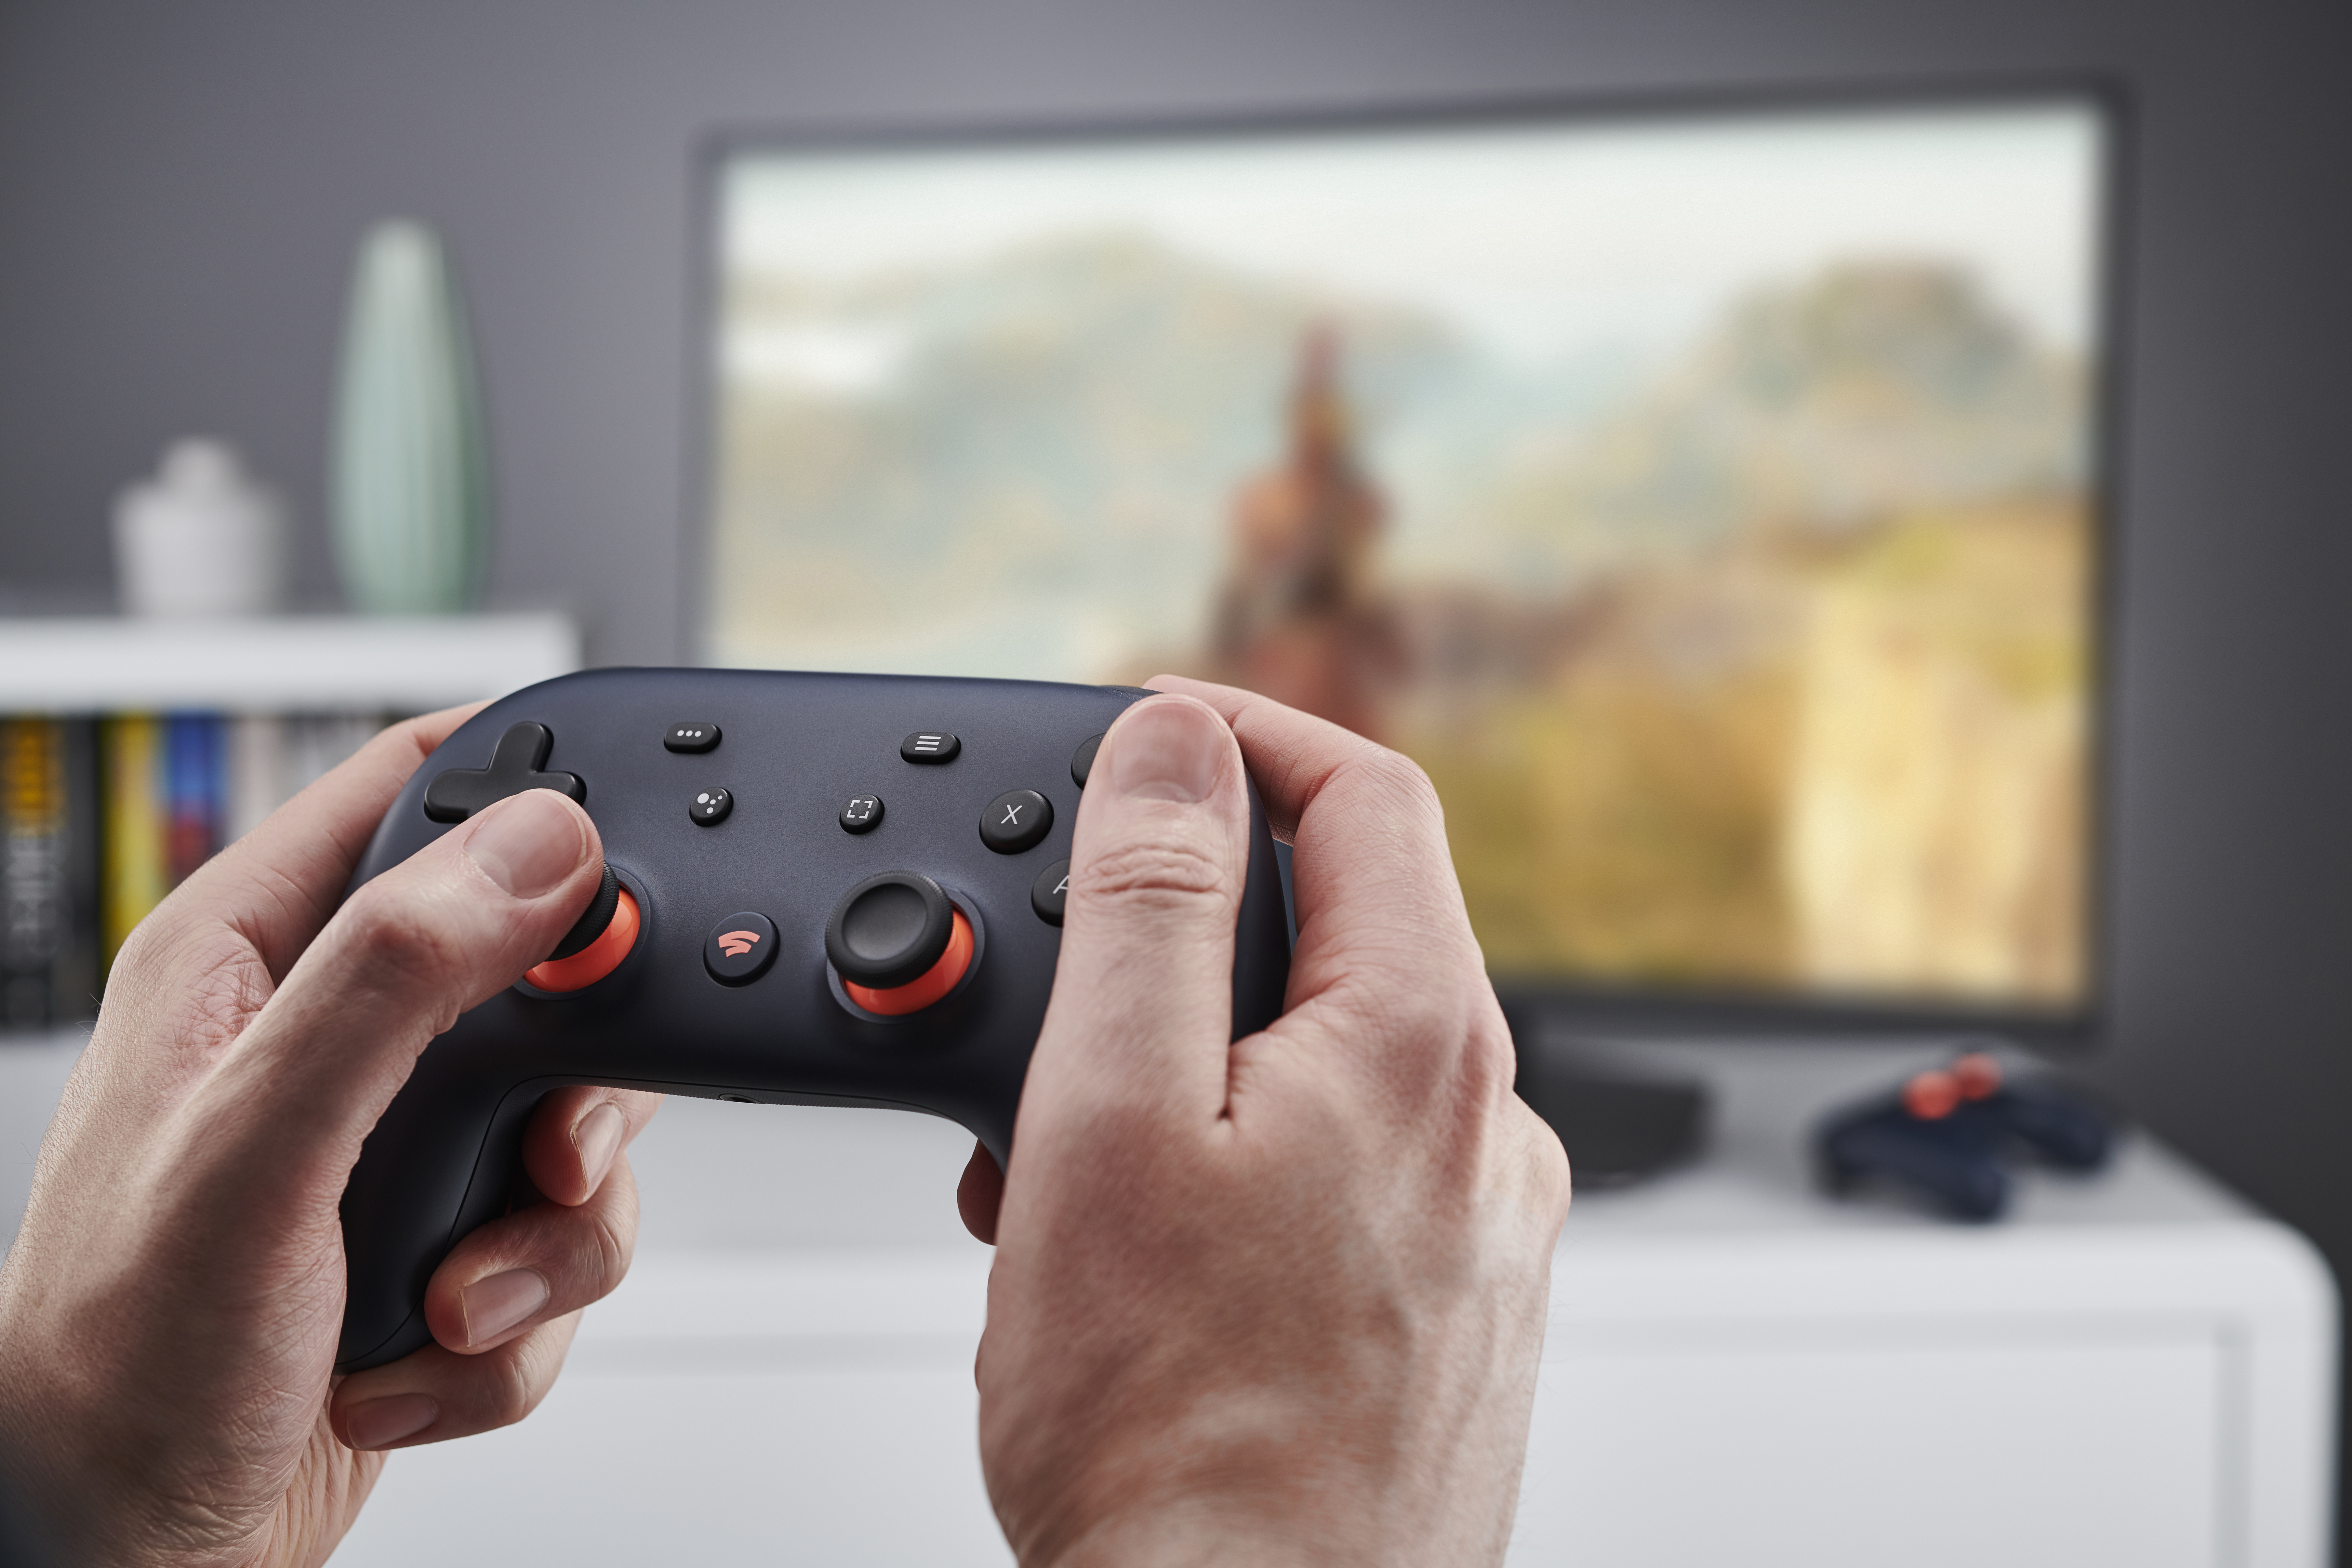 Google Stadia Video Game Controller